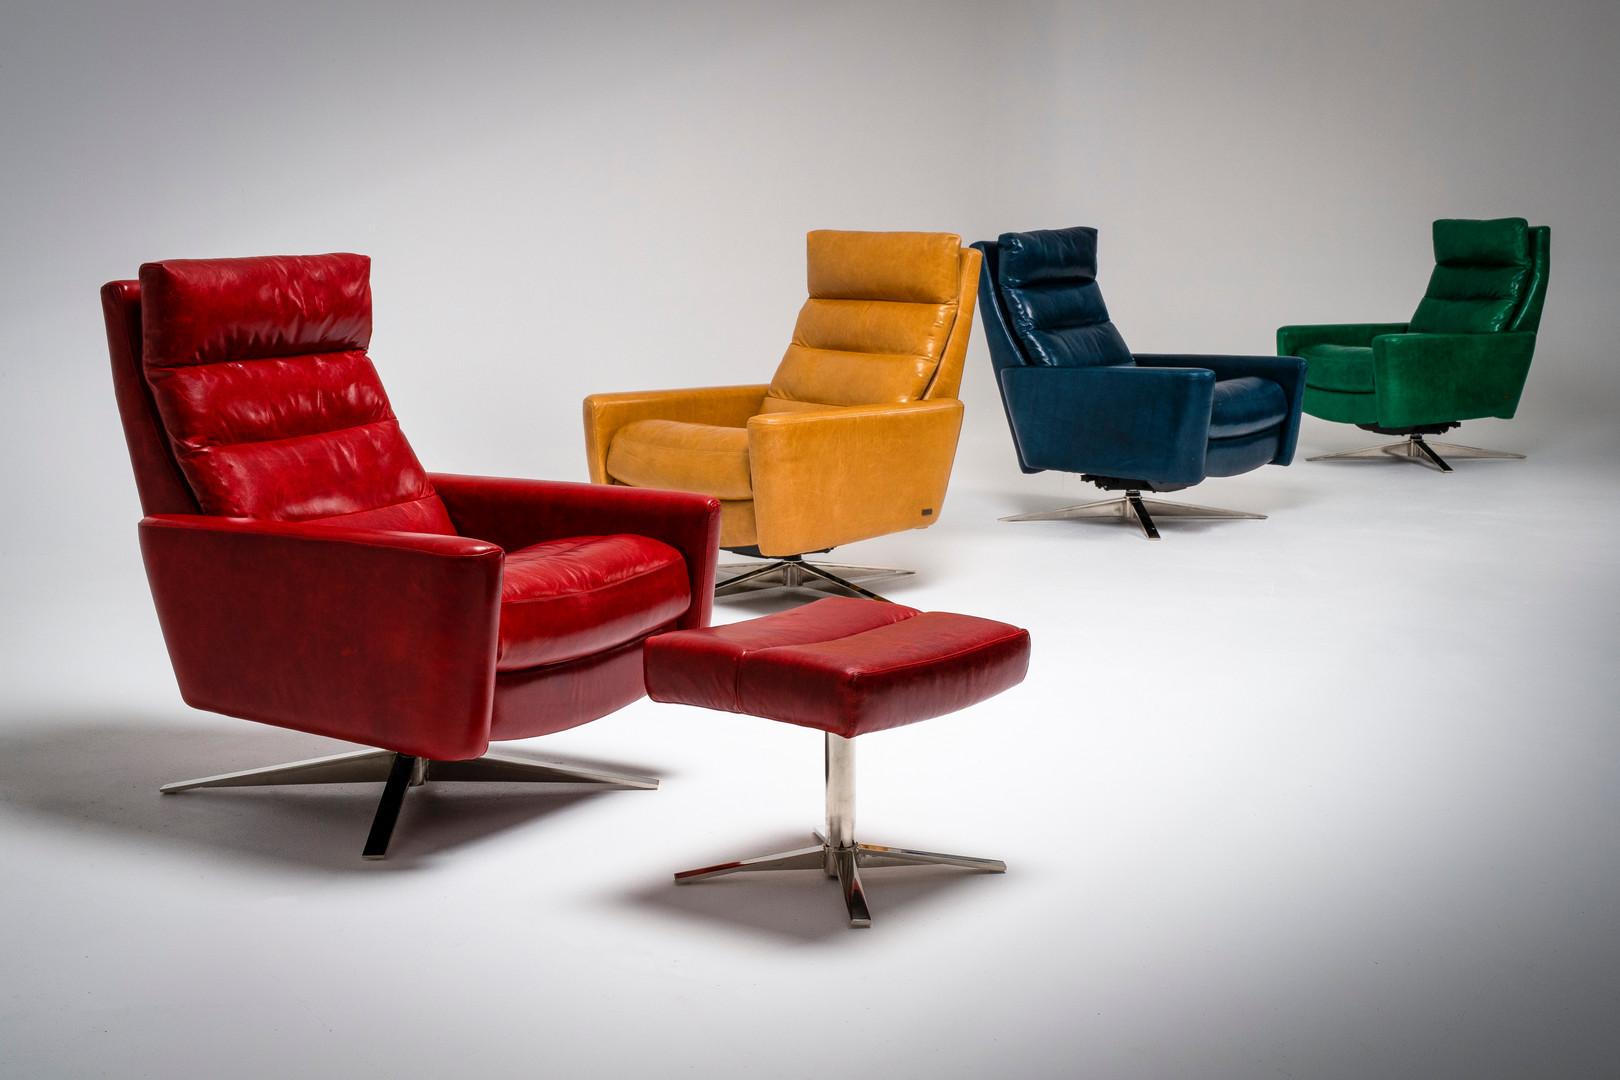 Cirrus Comfort Air Chairs